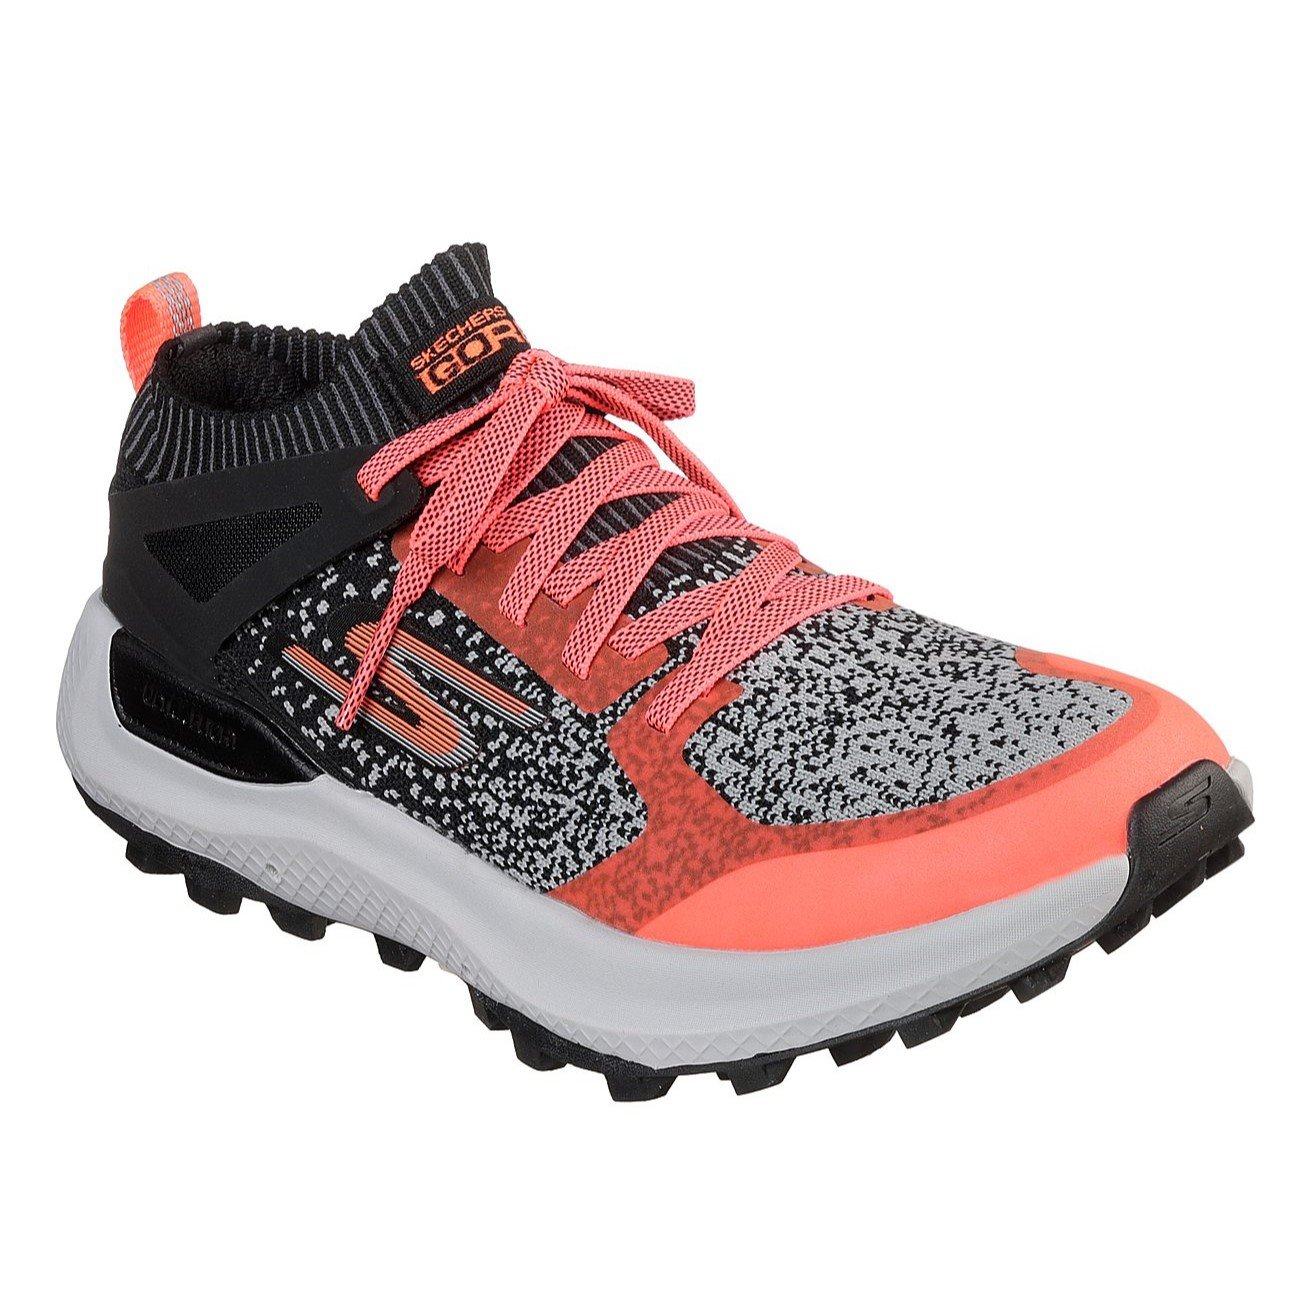 Skechers Women's GOrun MaxTrail 5 Ultra Shoe B079D9M1DL 9 B(M) US|Black/Hot Pink